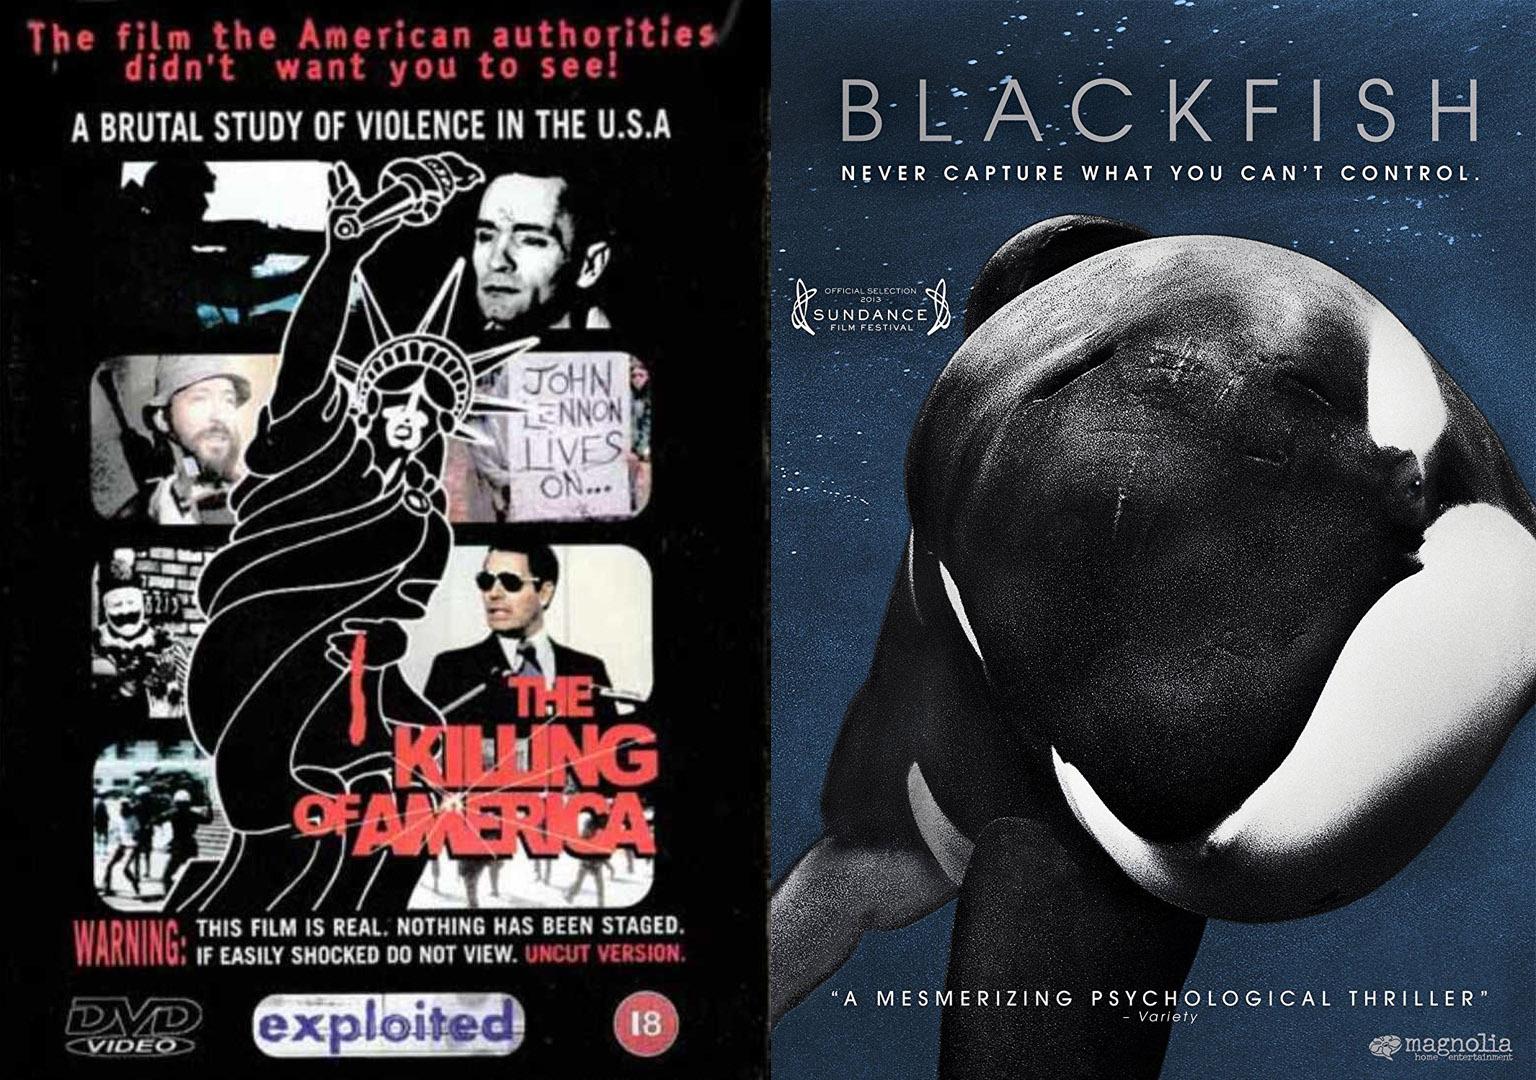 killing of america and blackfish posters.jpg